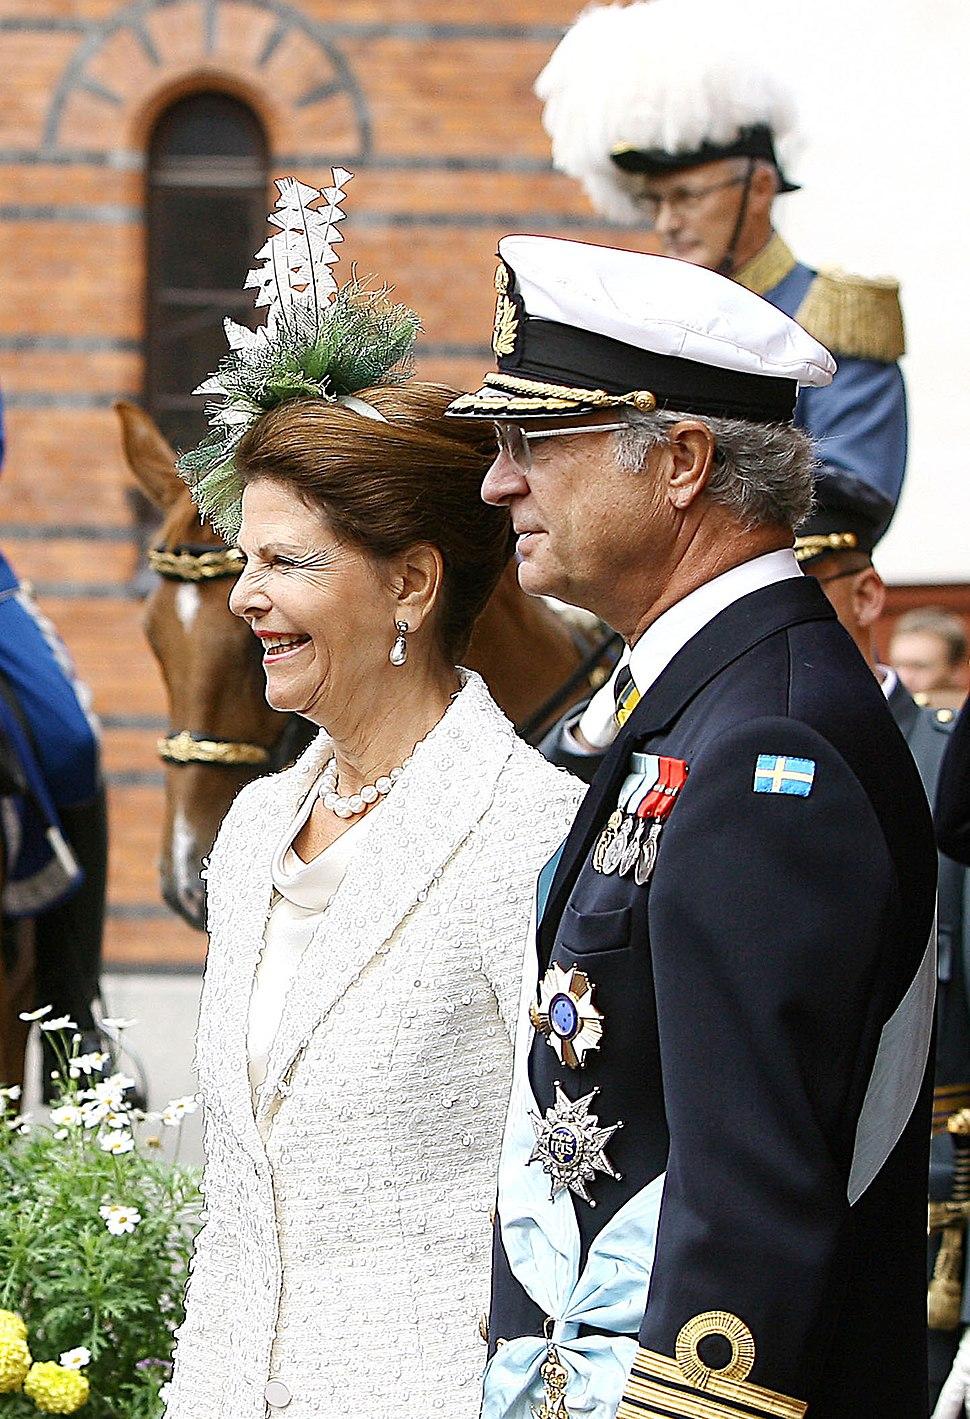 Kings of Sweden